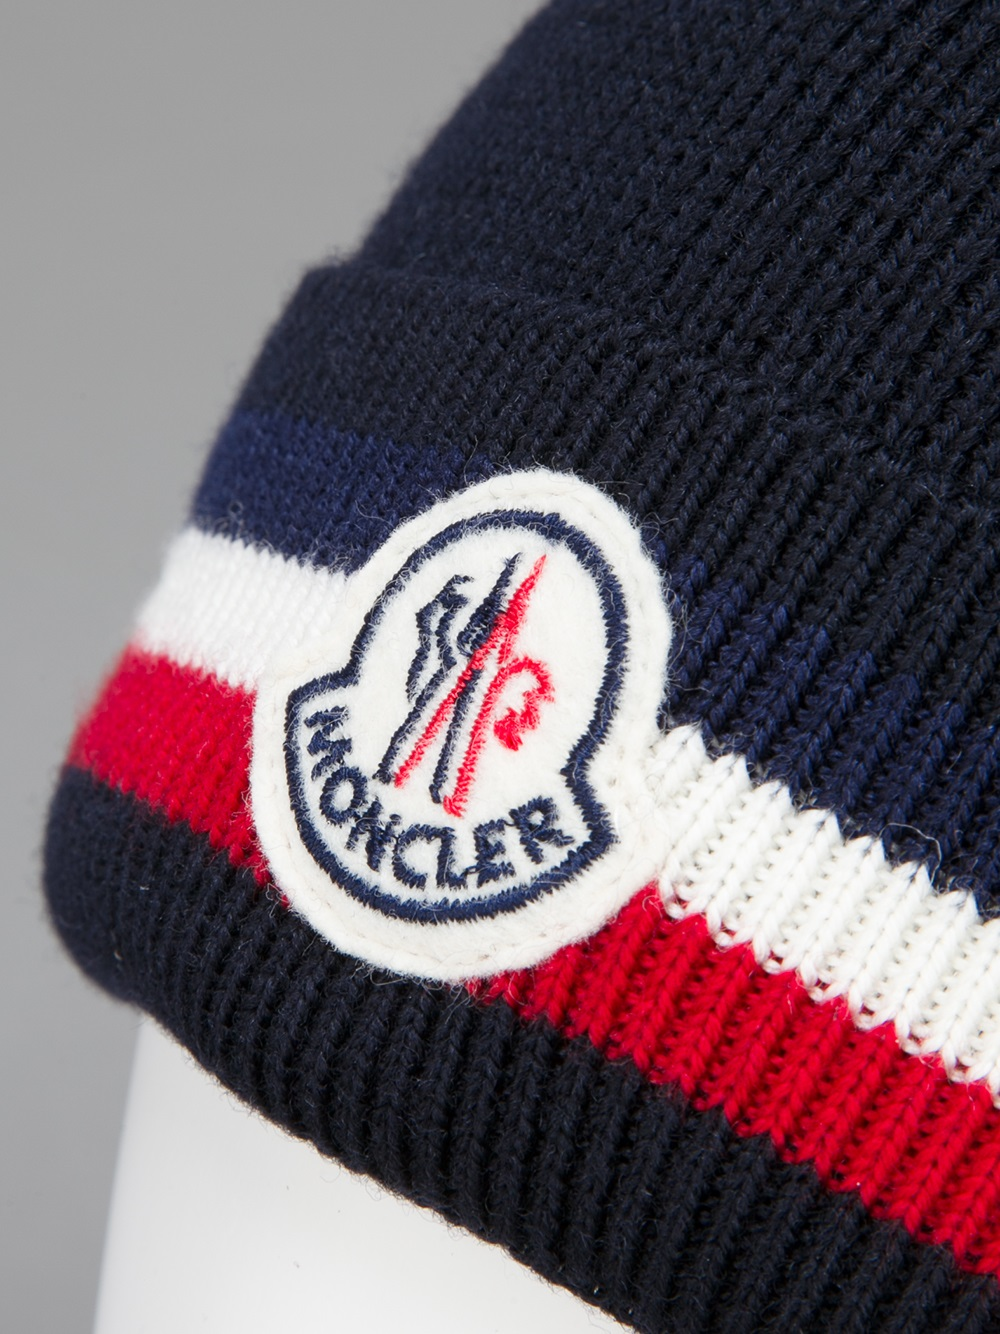 b44a880e22a Lyst - Moncler Logo Beanie Hat in Blue for Men